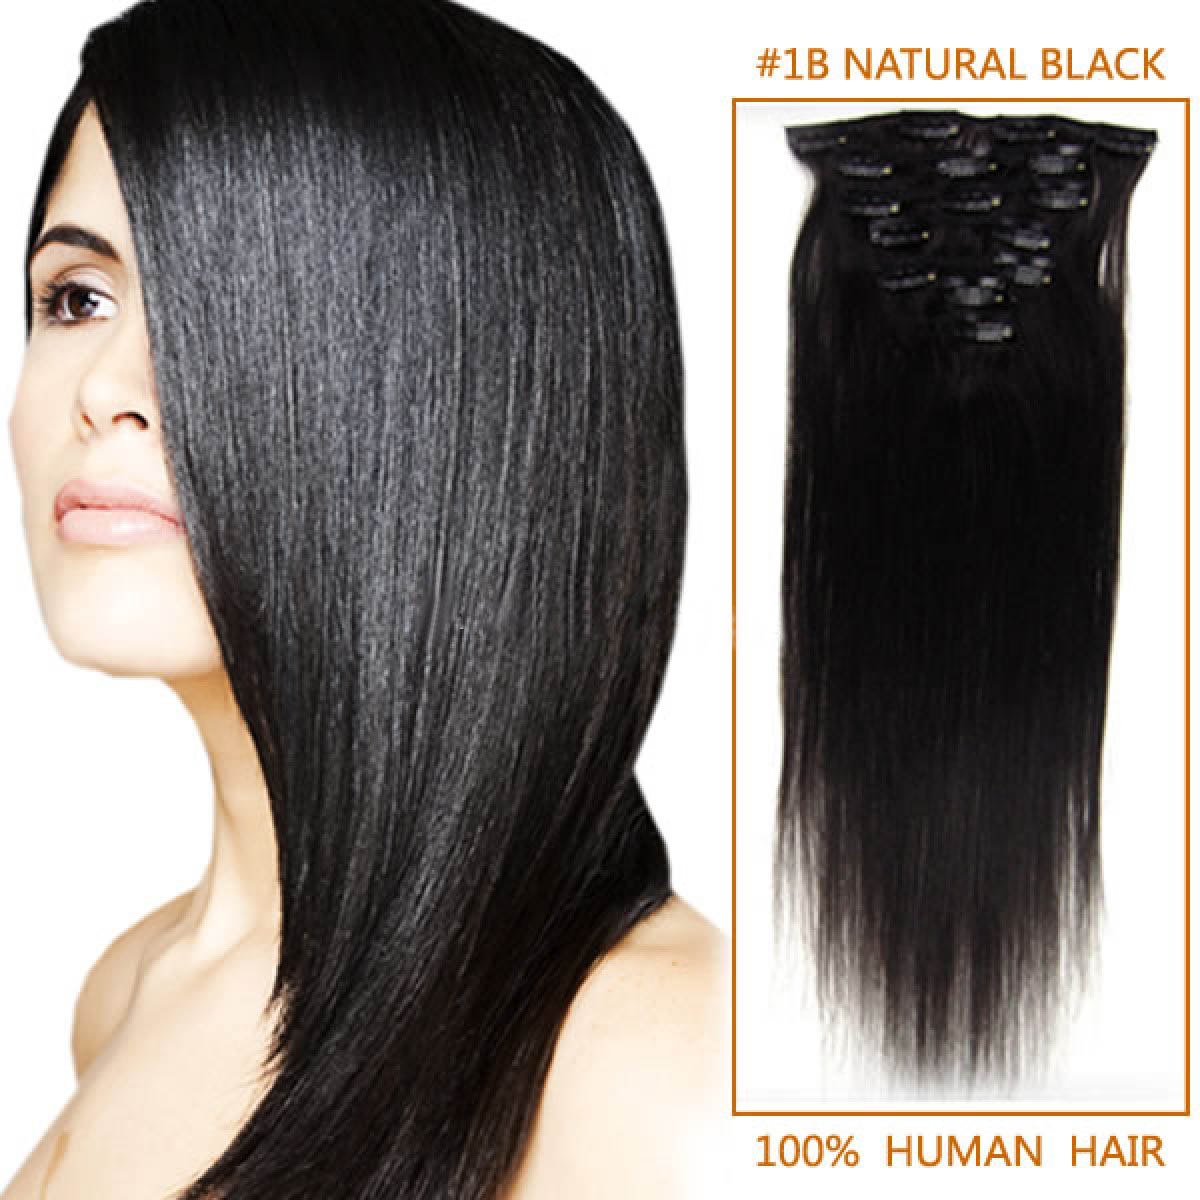 28 Inch #1b Natural Black Clip In Human Hair Extensions 11pcs